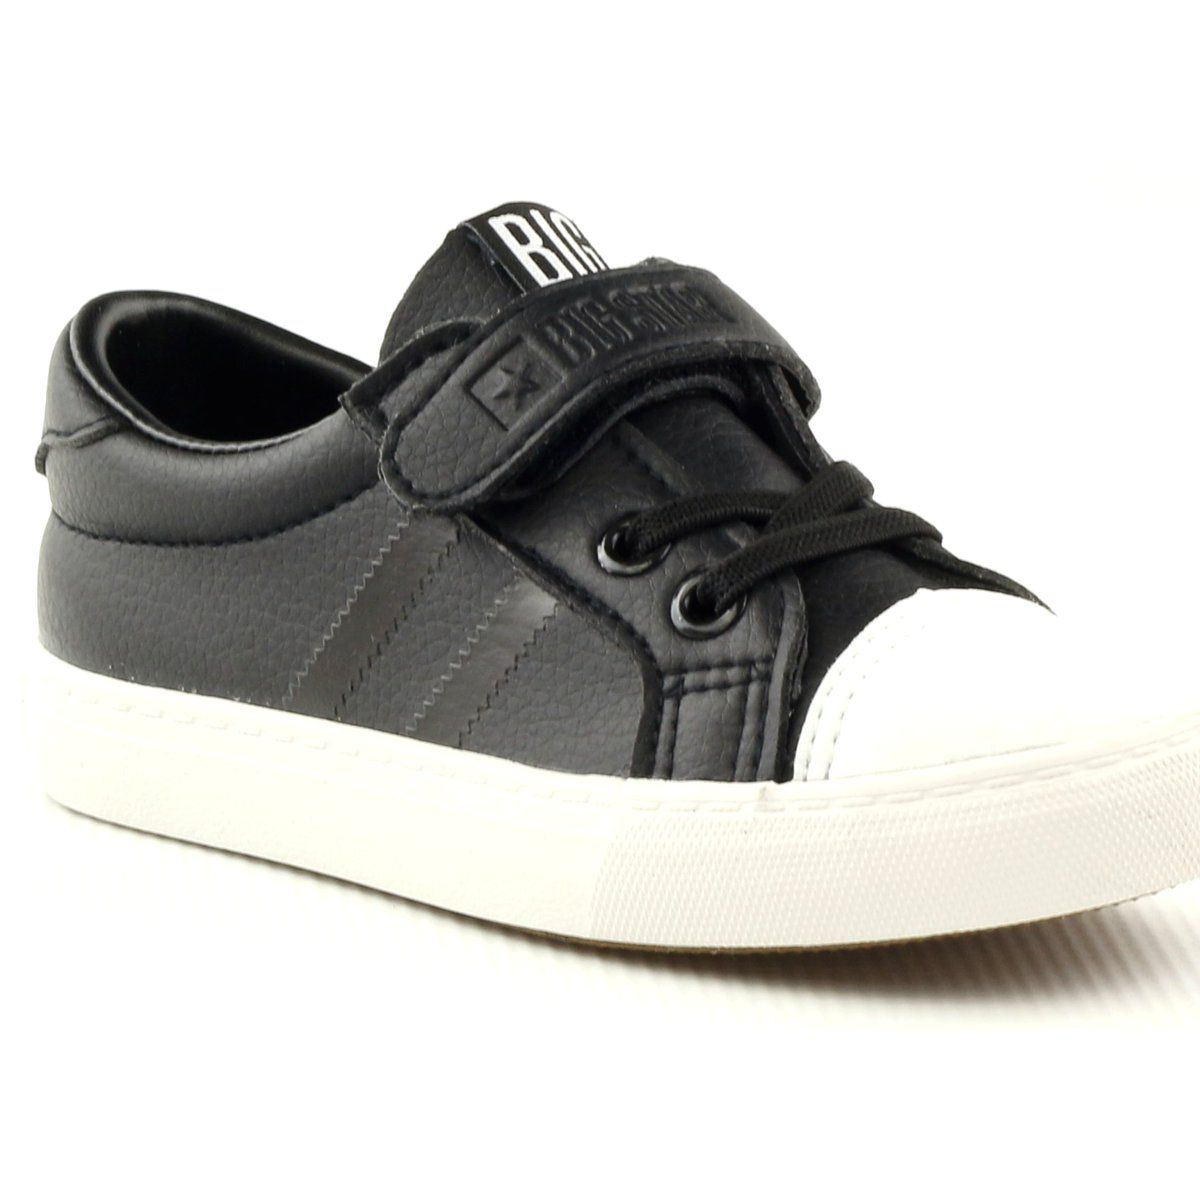 Trampki Sportowe Czarne Big Star 374039 Biale Baby Shoes Sneakers Shoes